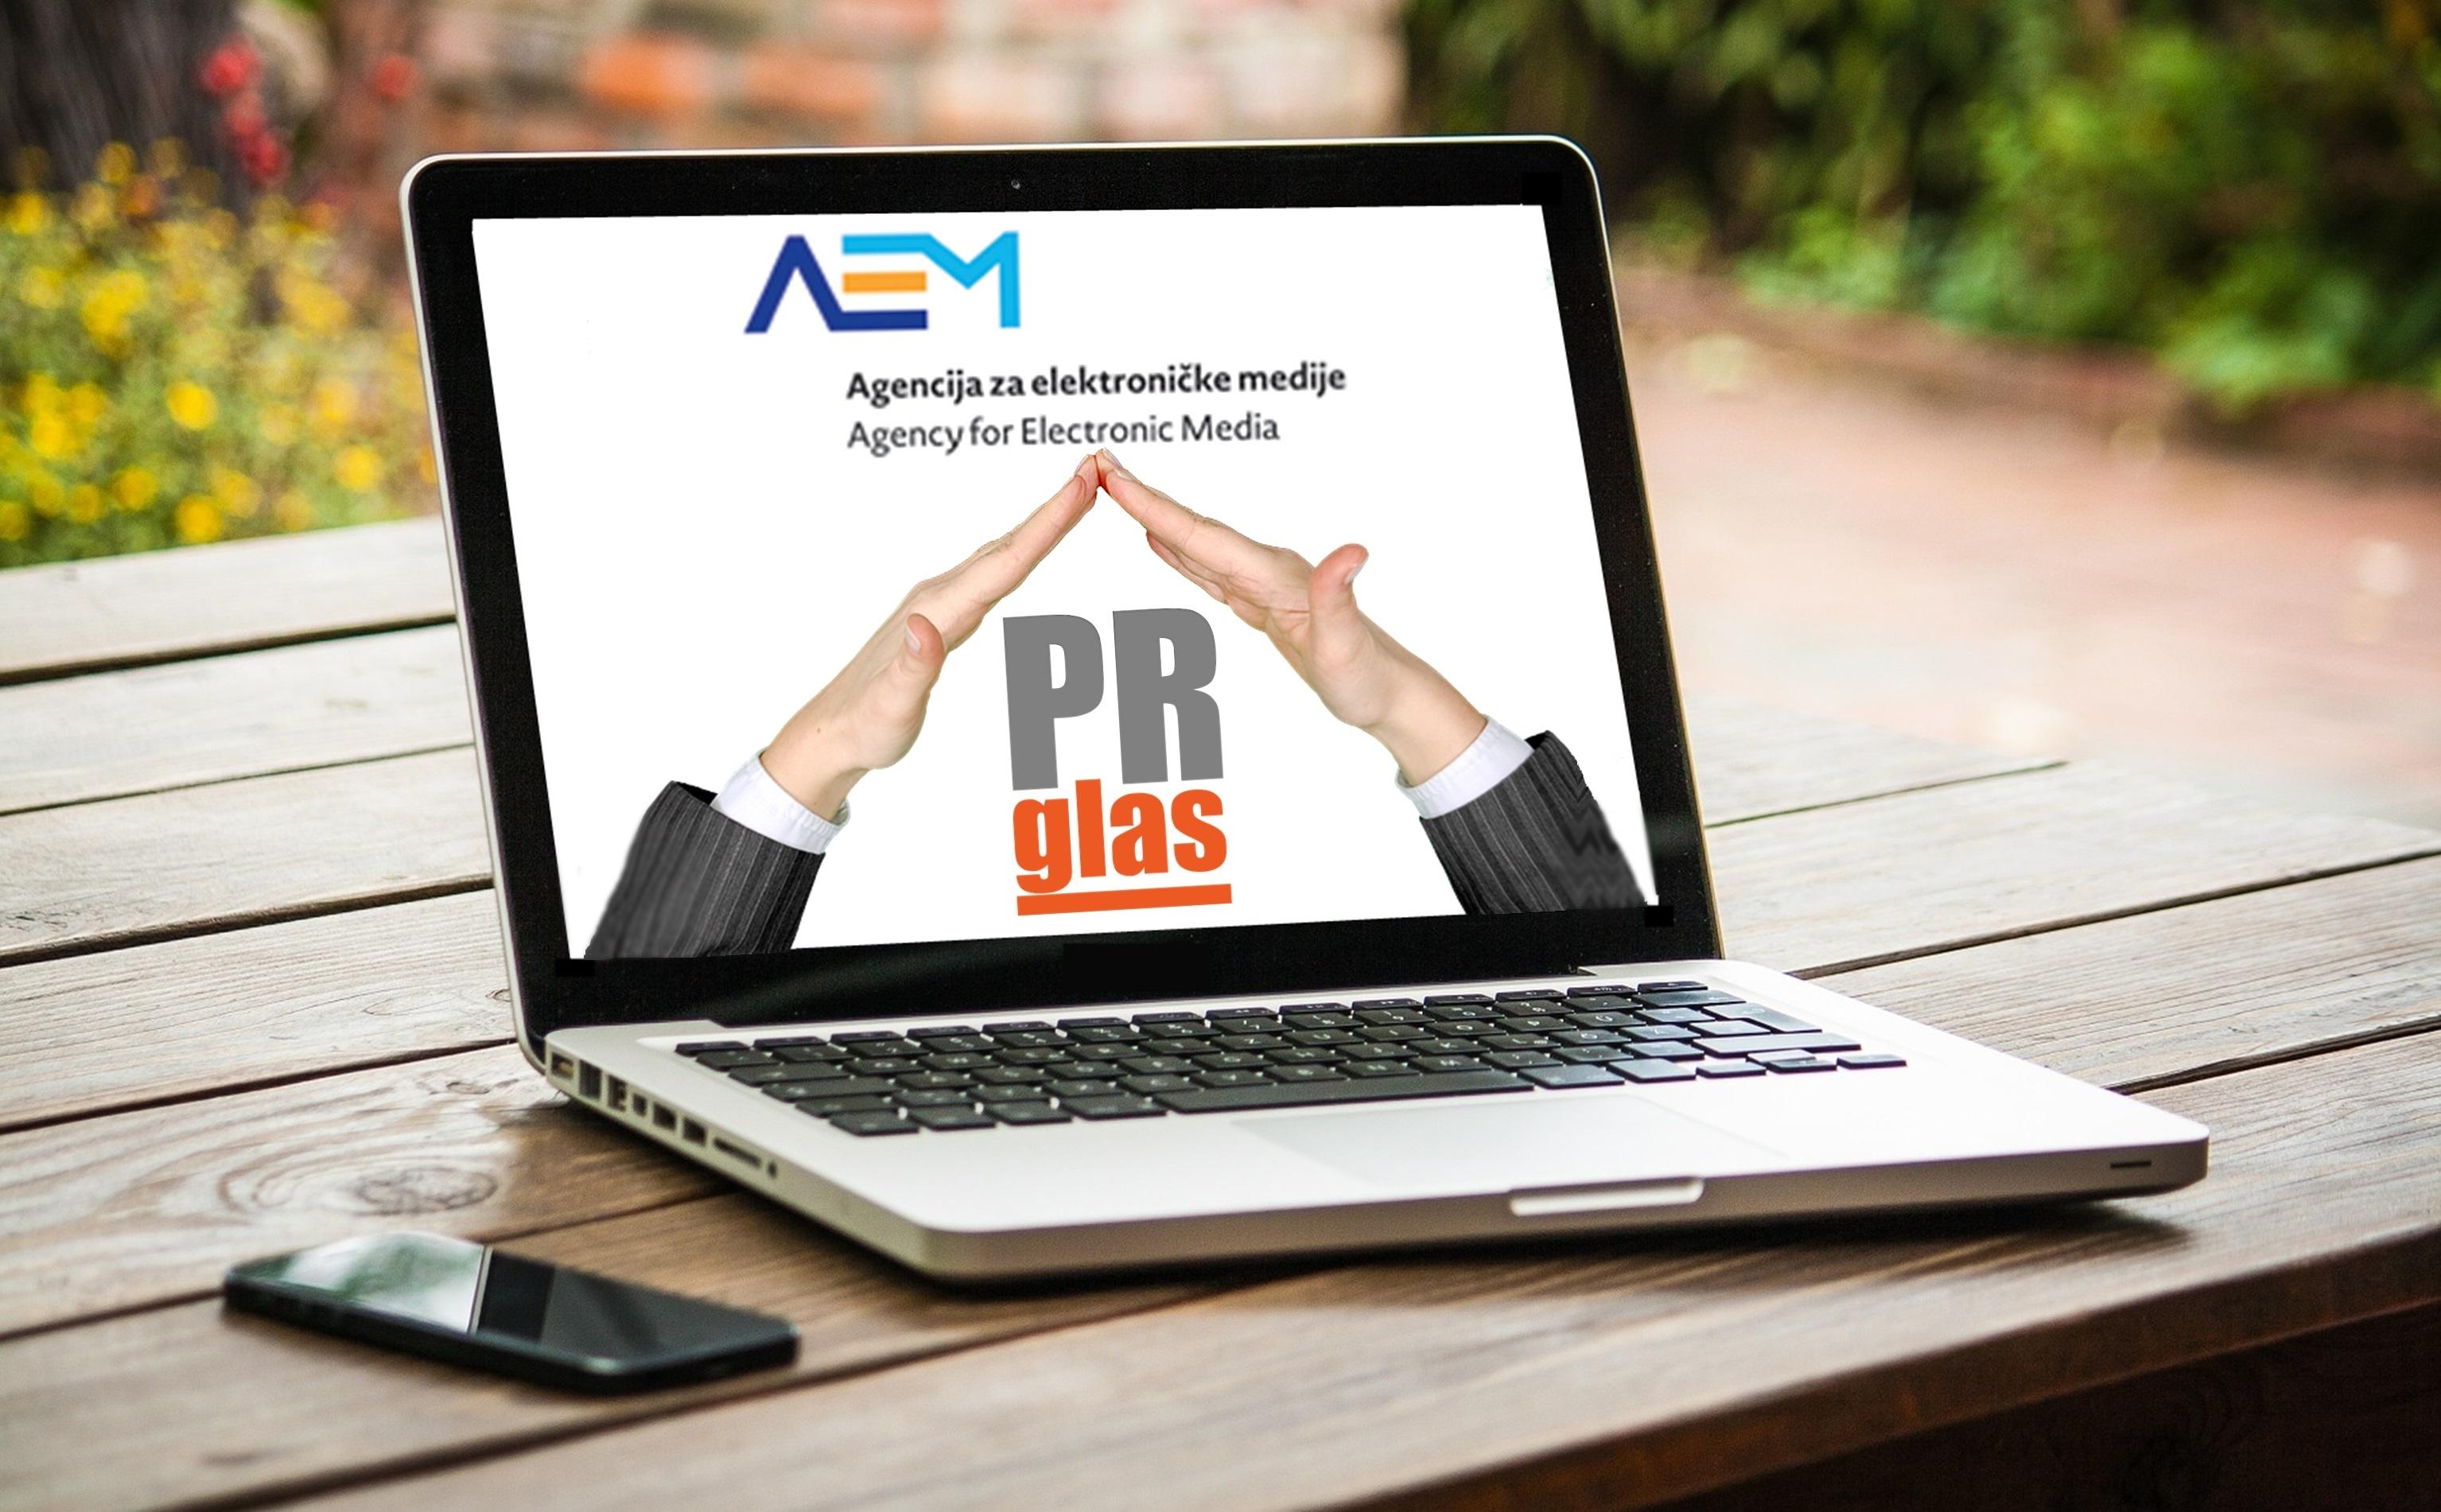 PRglas Agencija za elektronicke medije medij